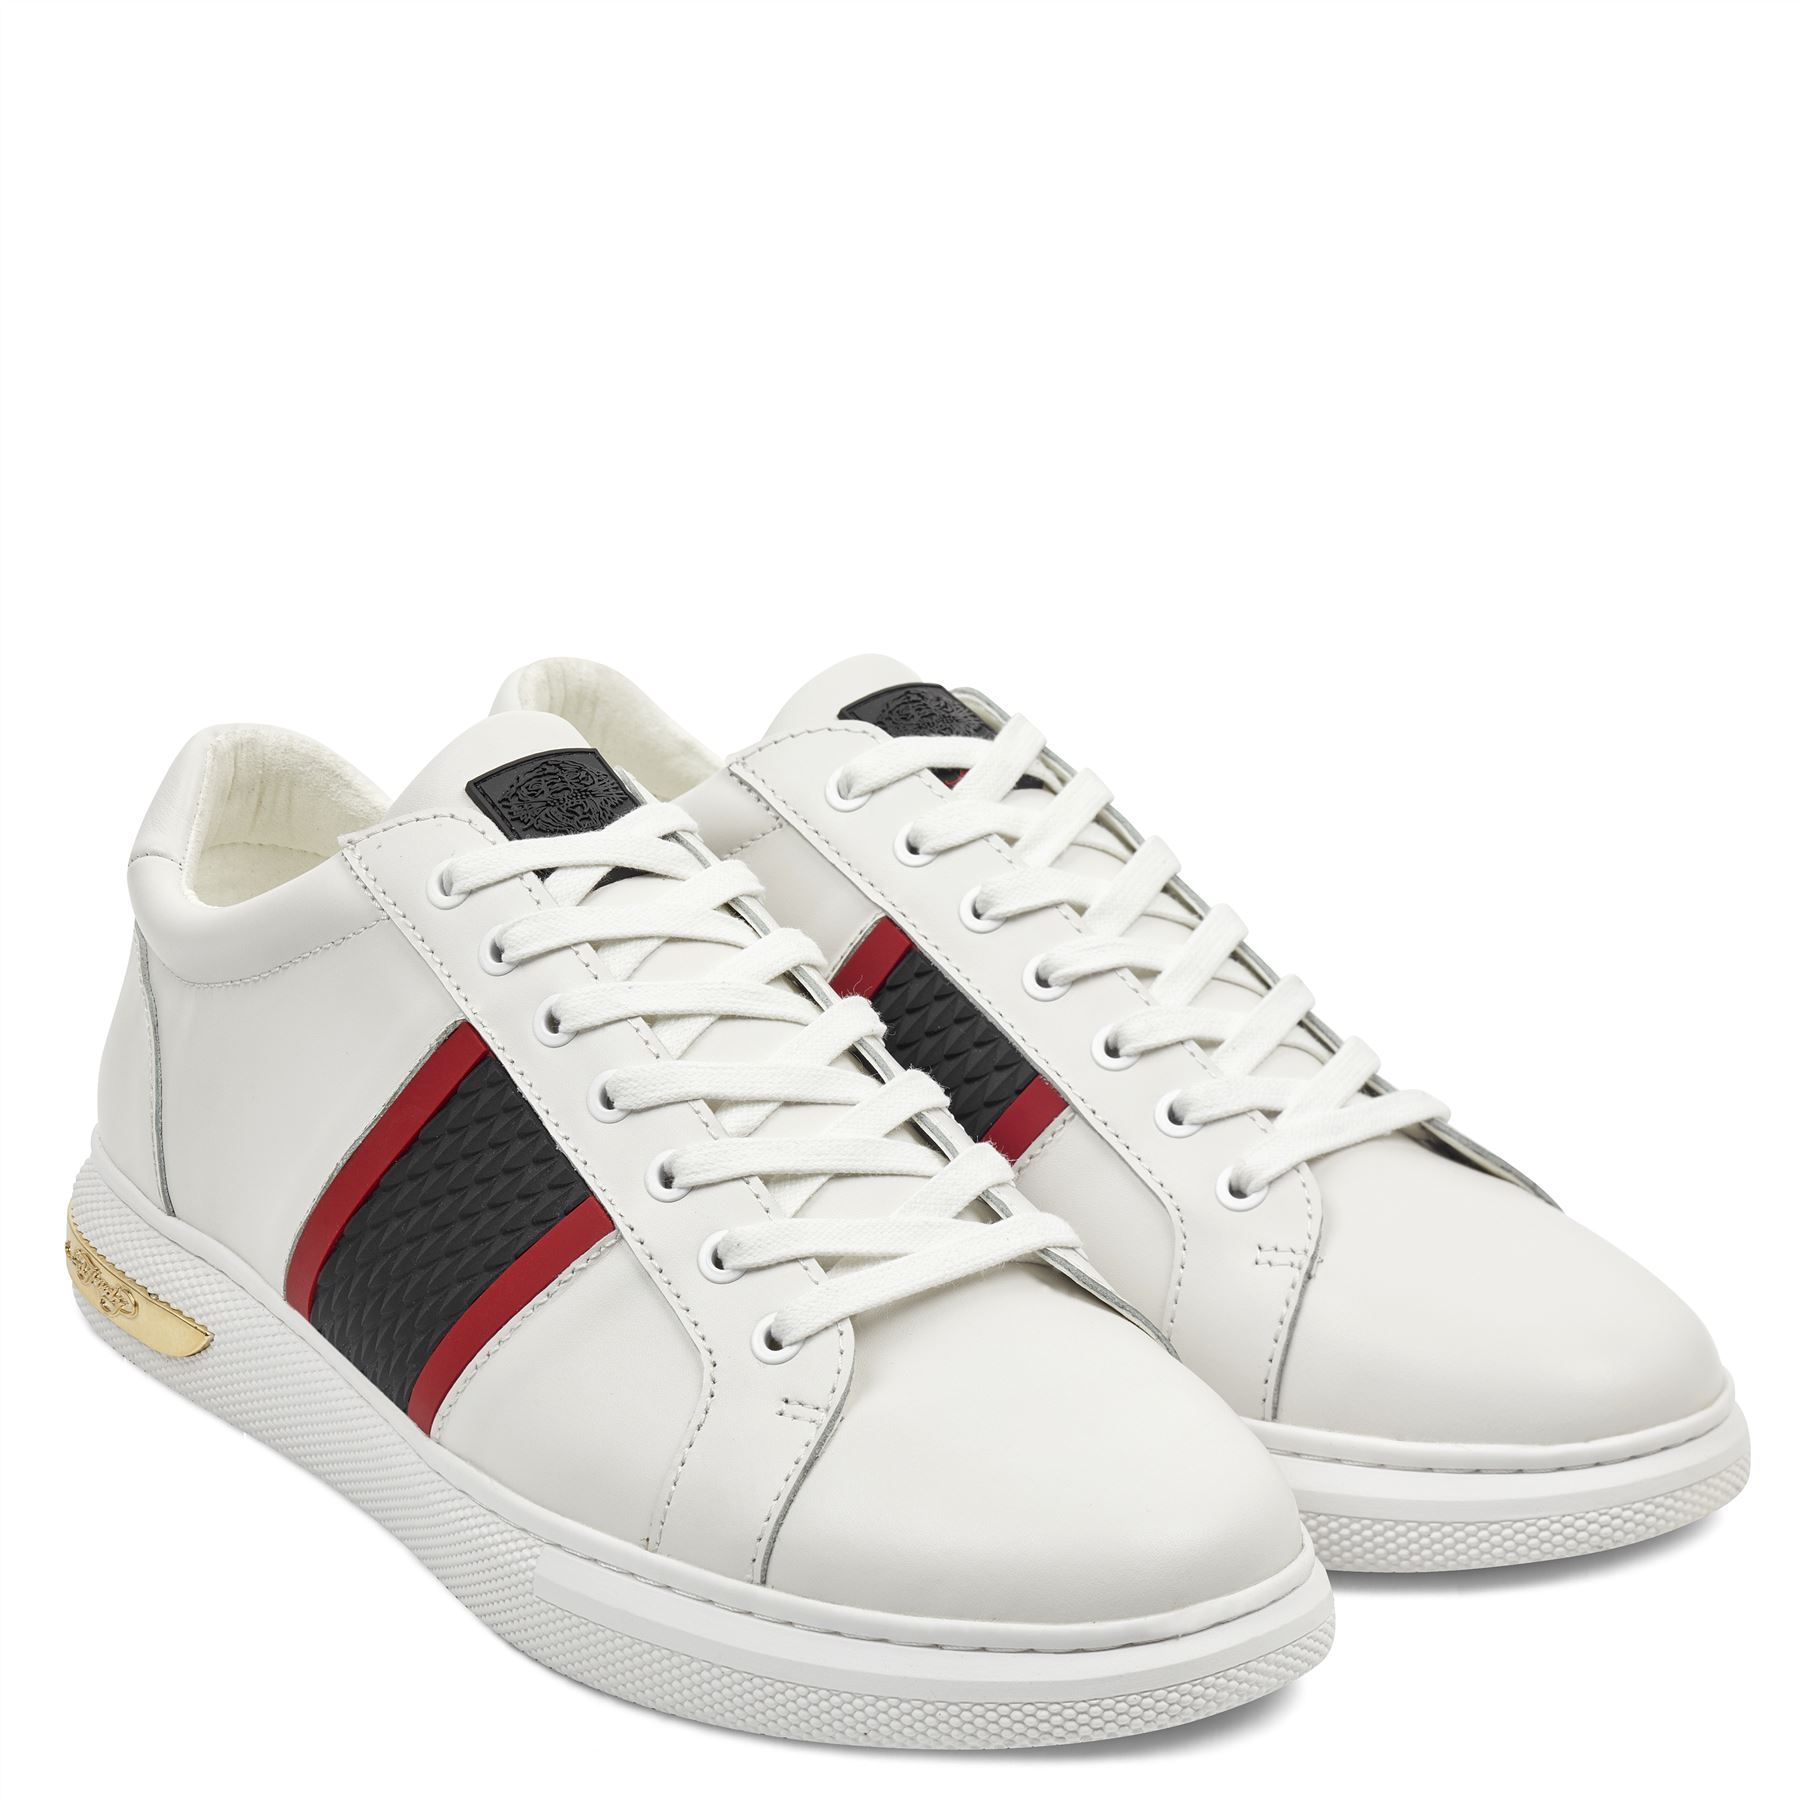 Ed Hardy Herren Blade Low Top Leder Leder Leder Schutz Turnschuhe Weiß Schwarz Schuhe a31ed0